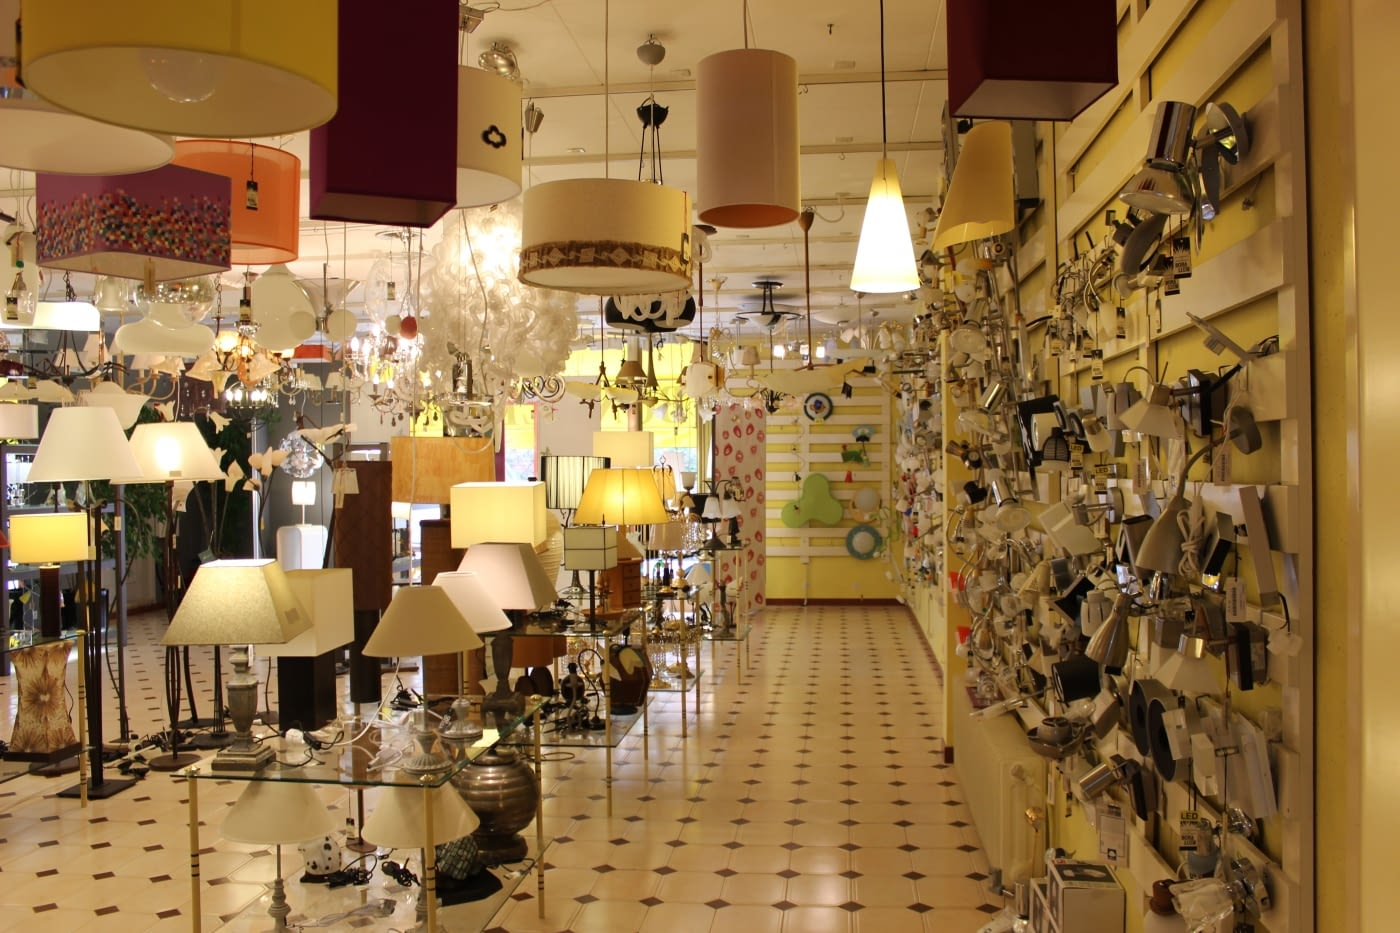 Bona Llum botiga petita